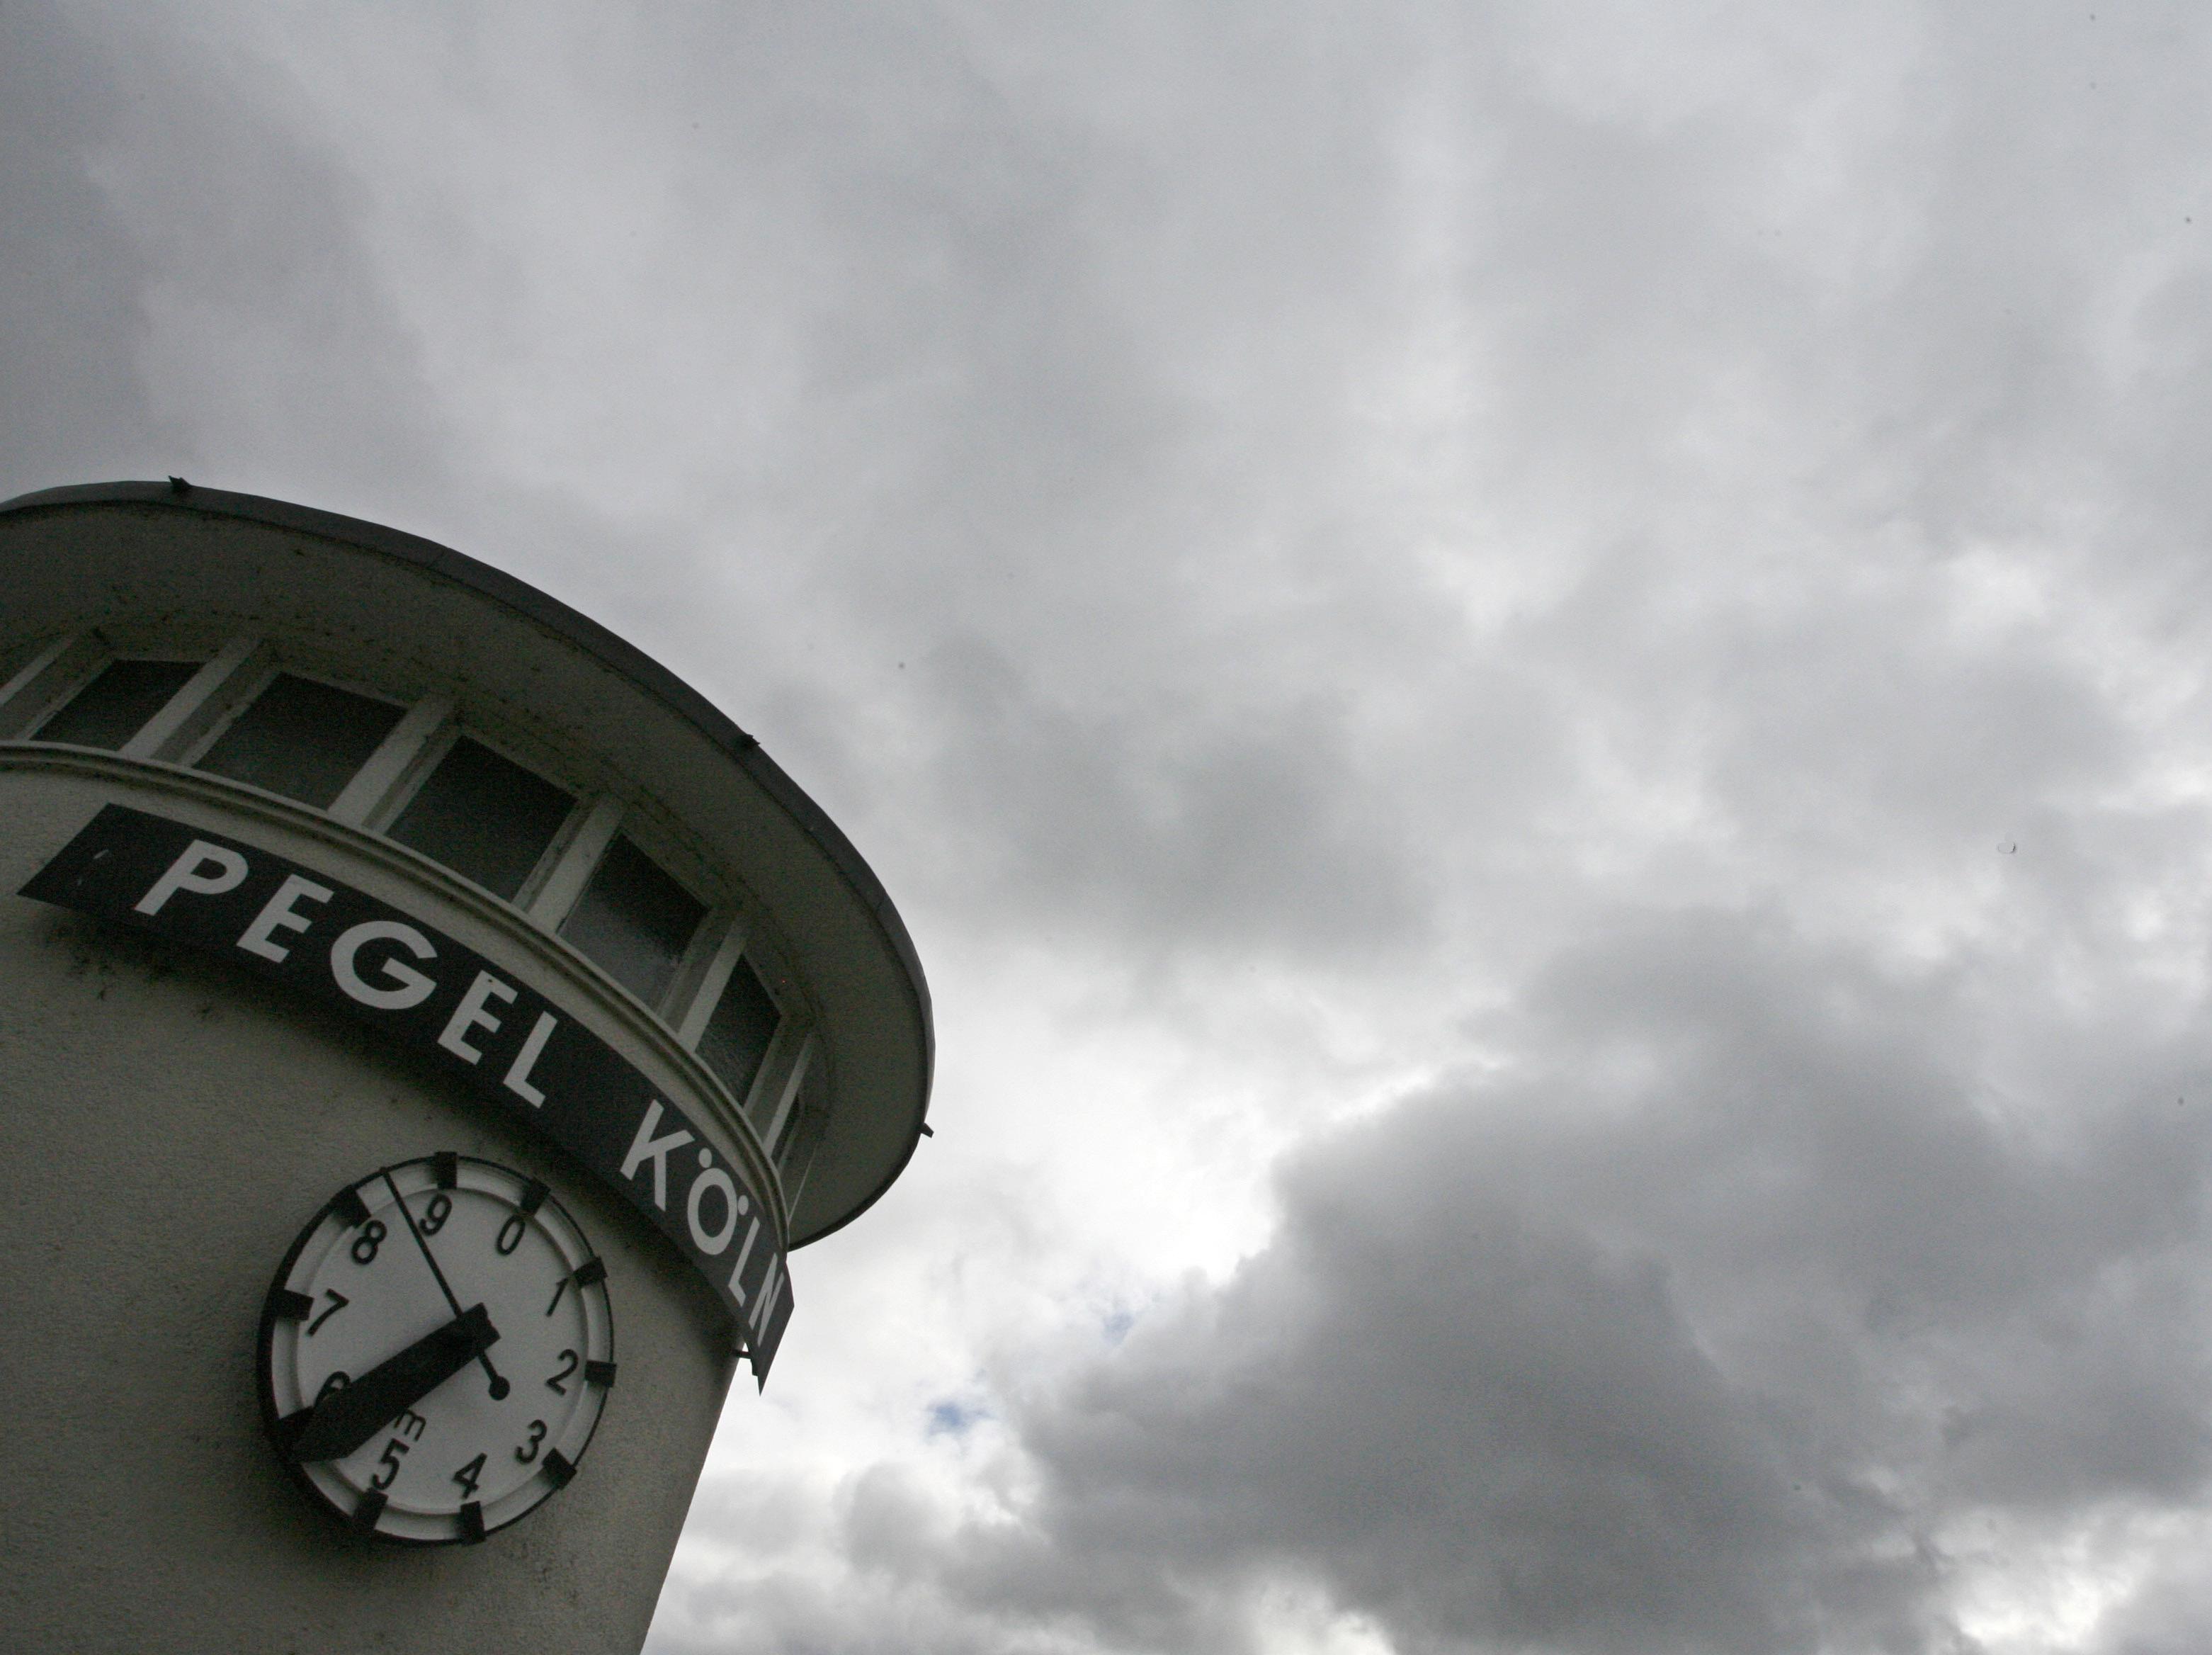 Pegel Köln